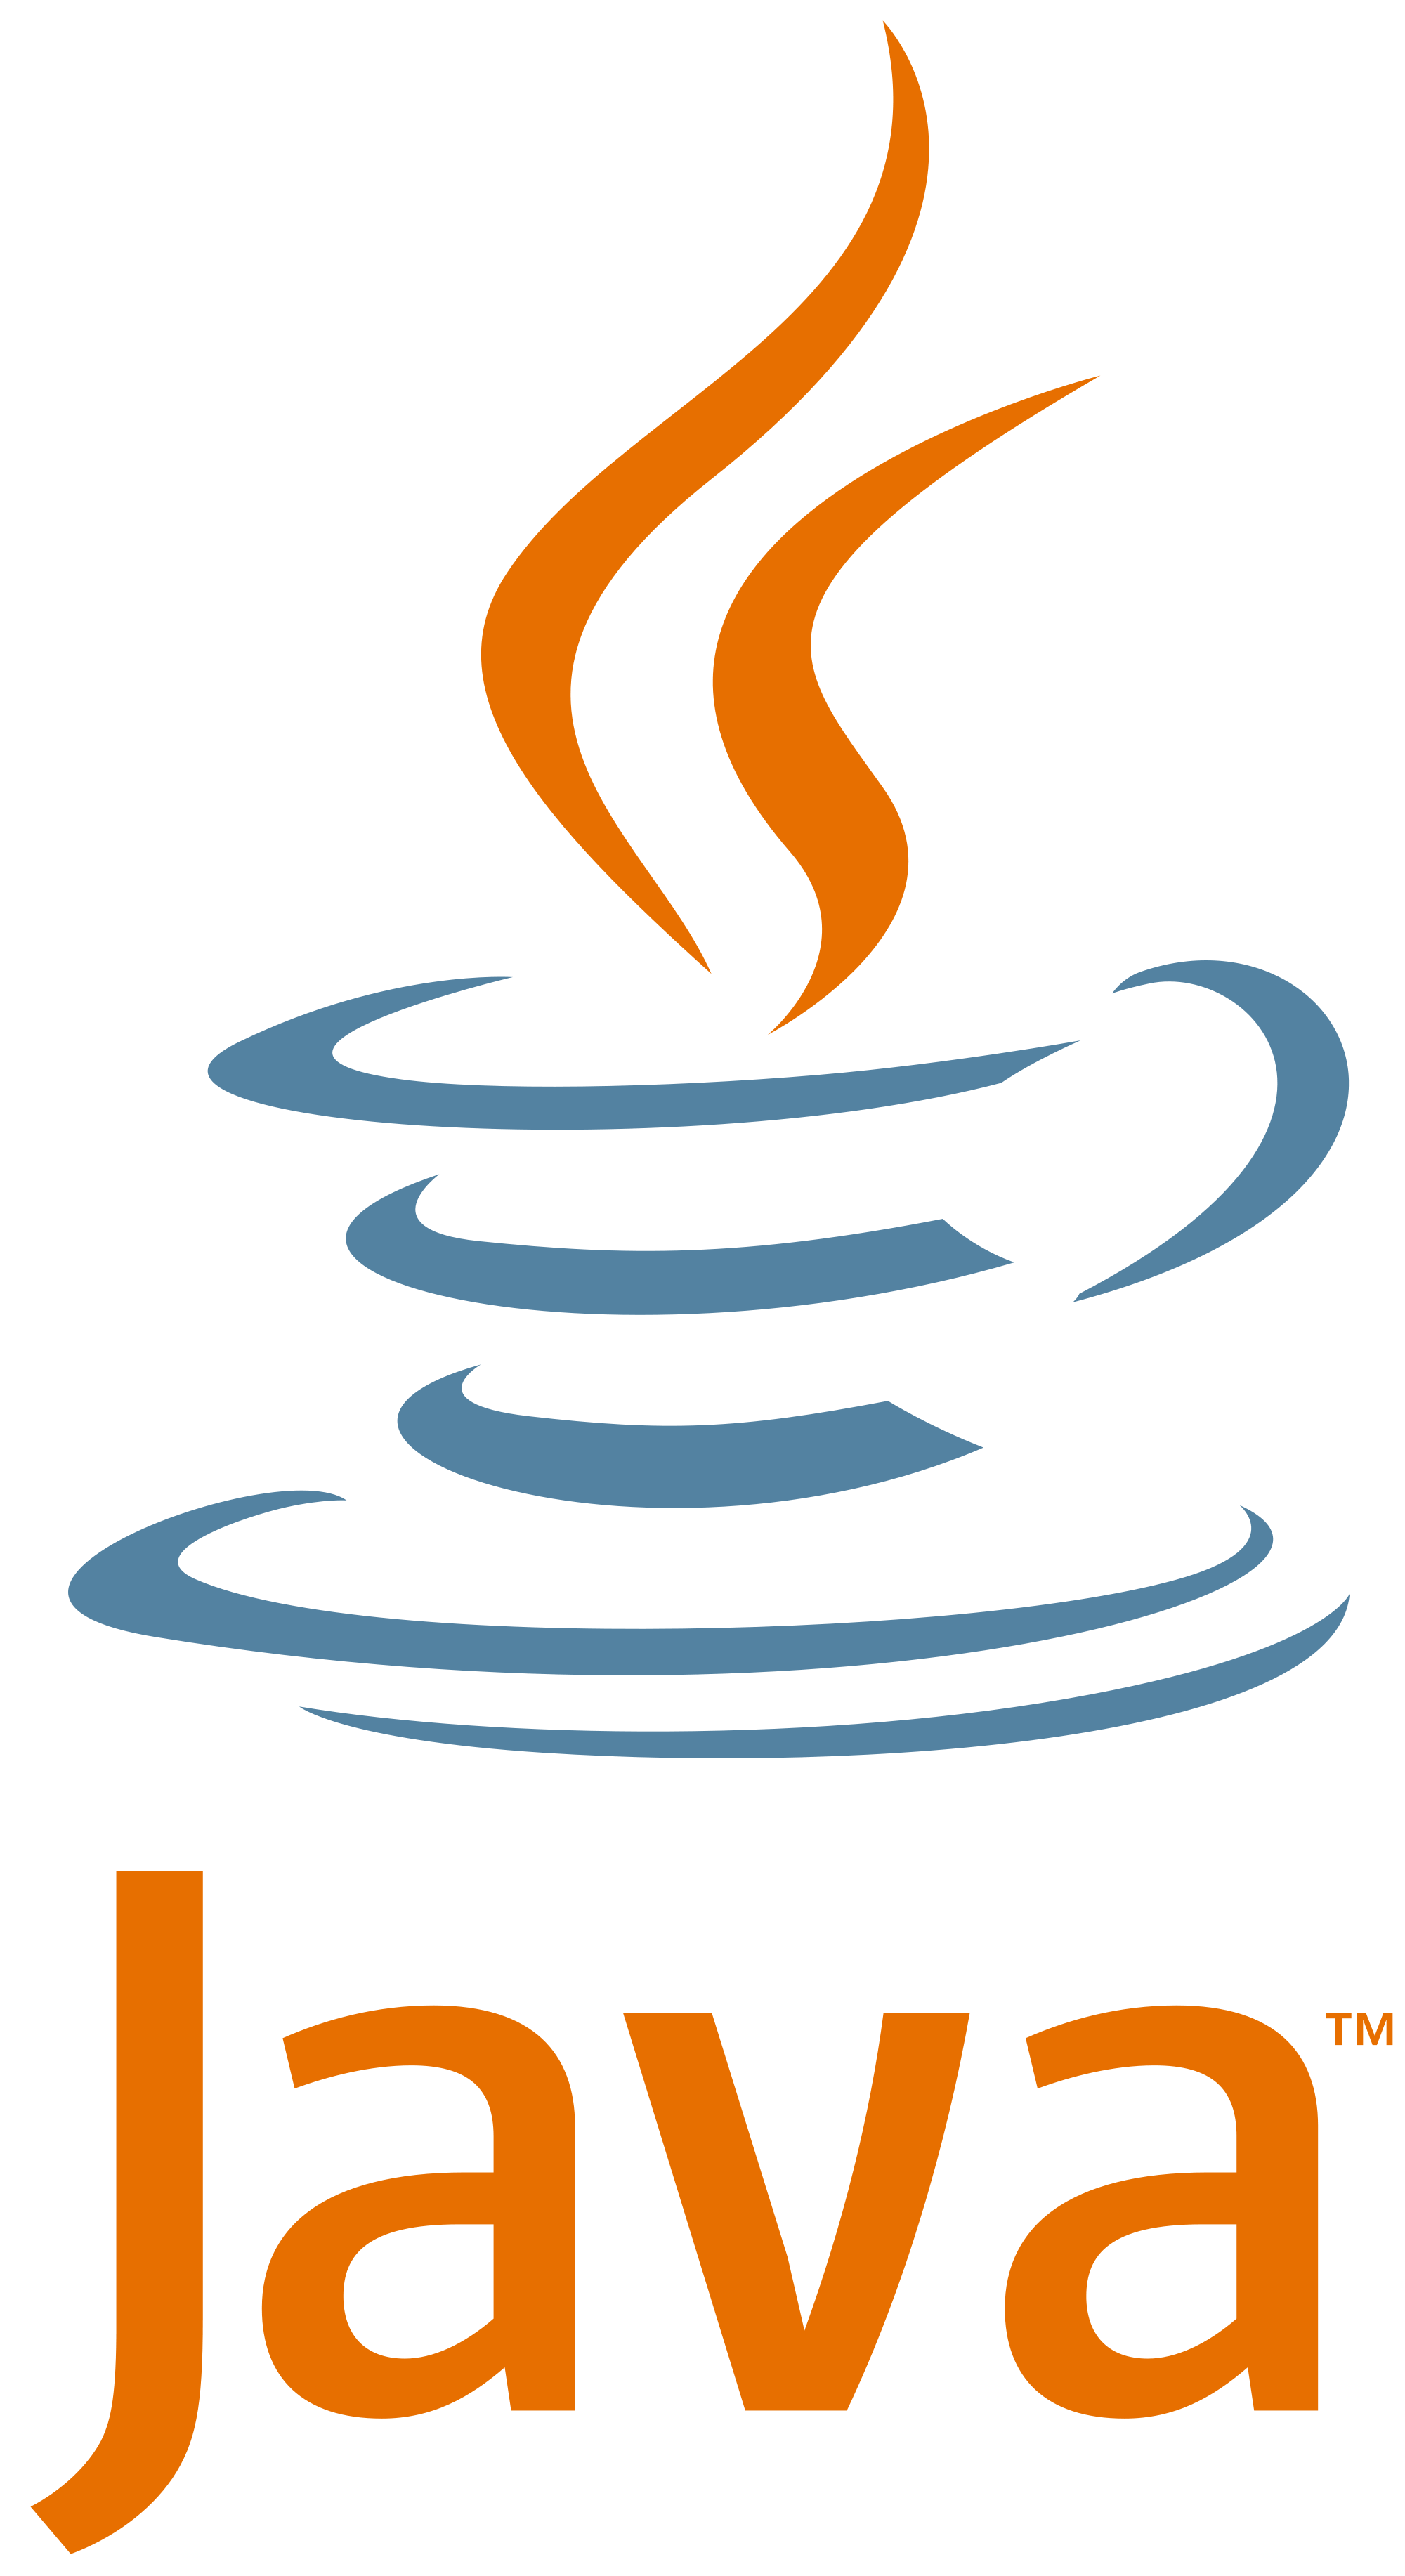 Pin by DLPNG on Design Resources | Java programming language